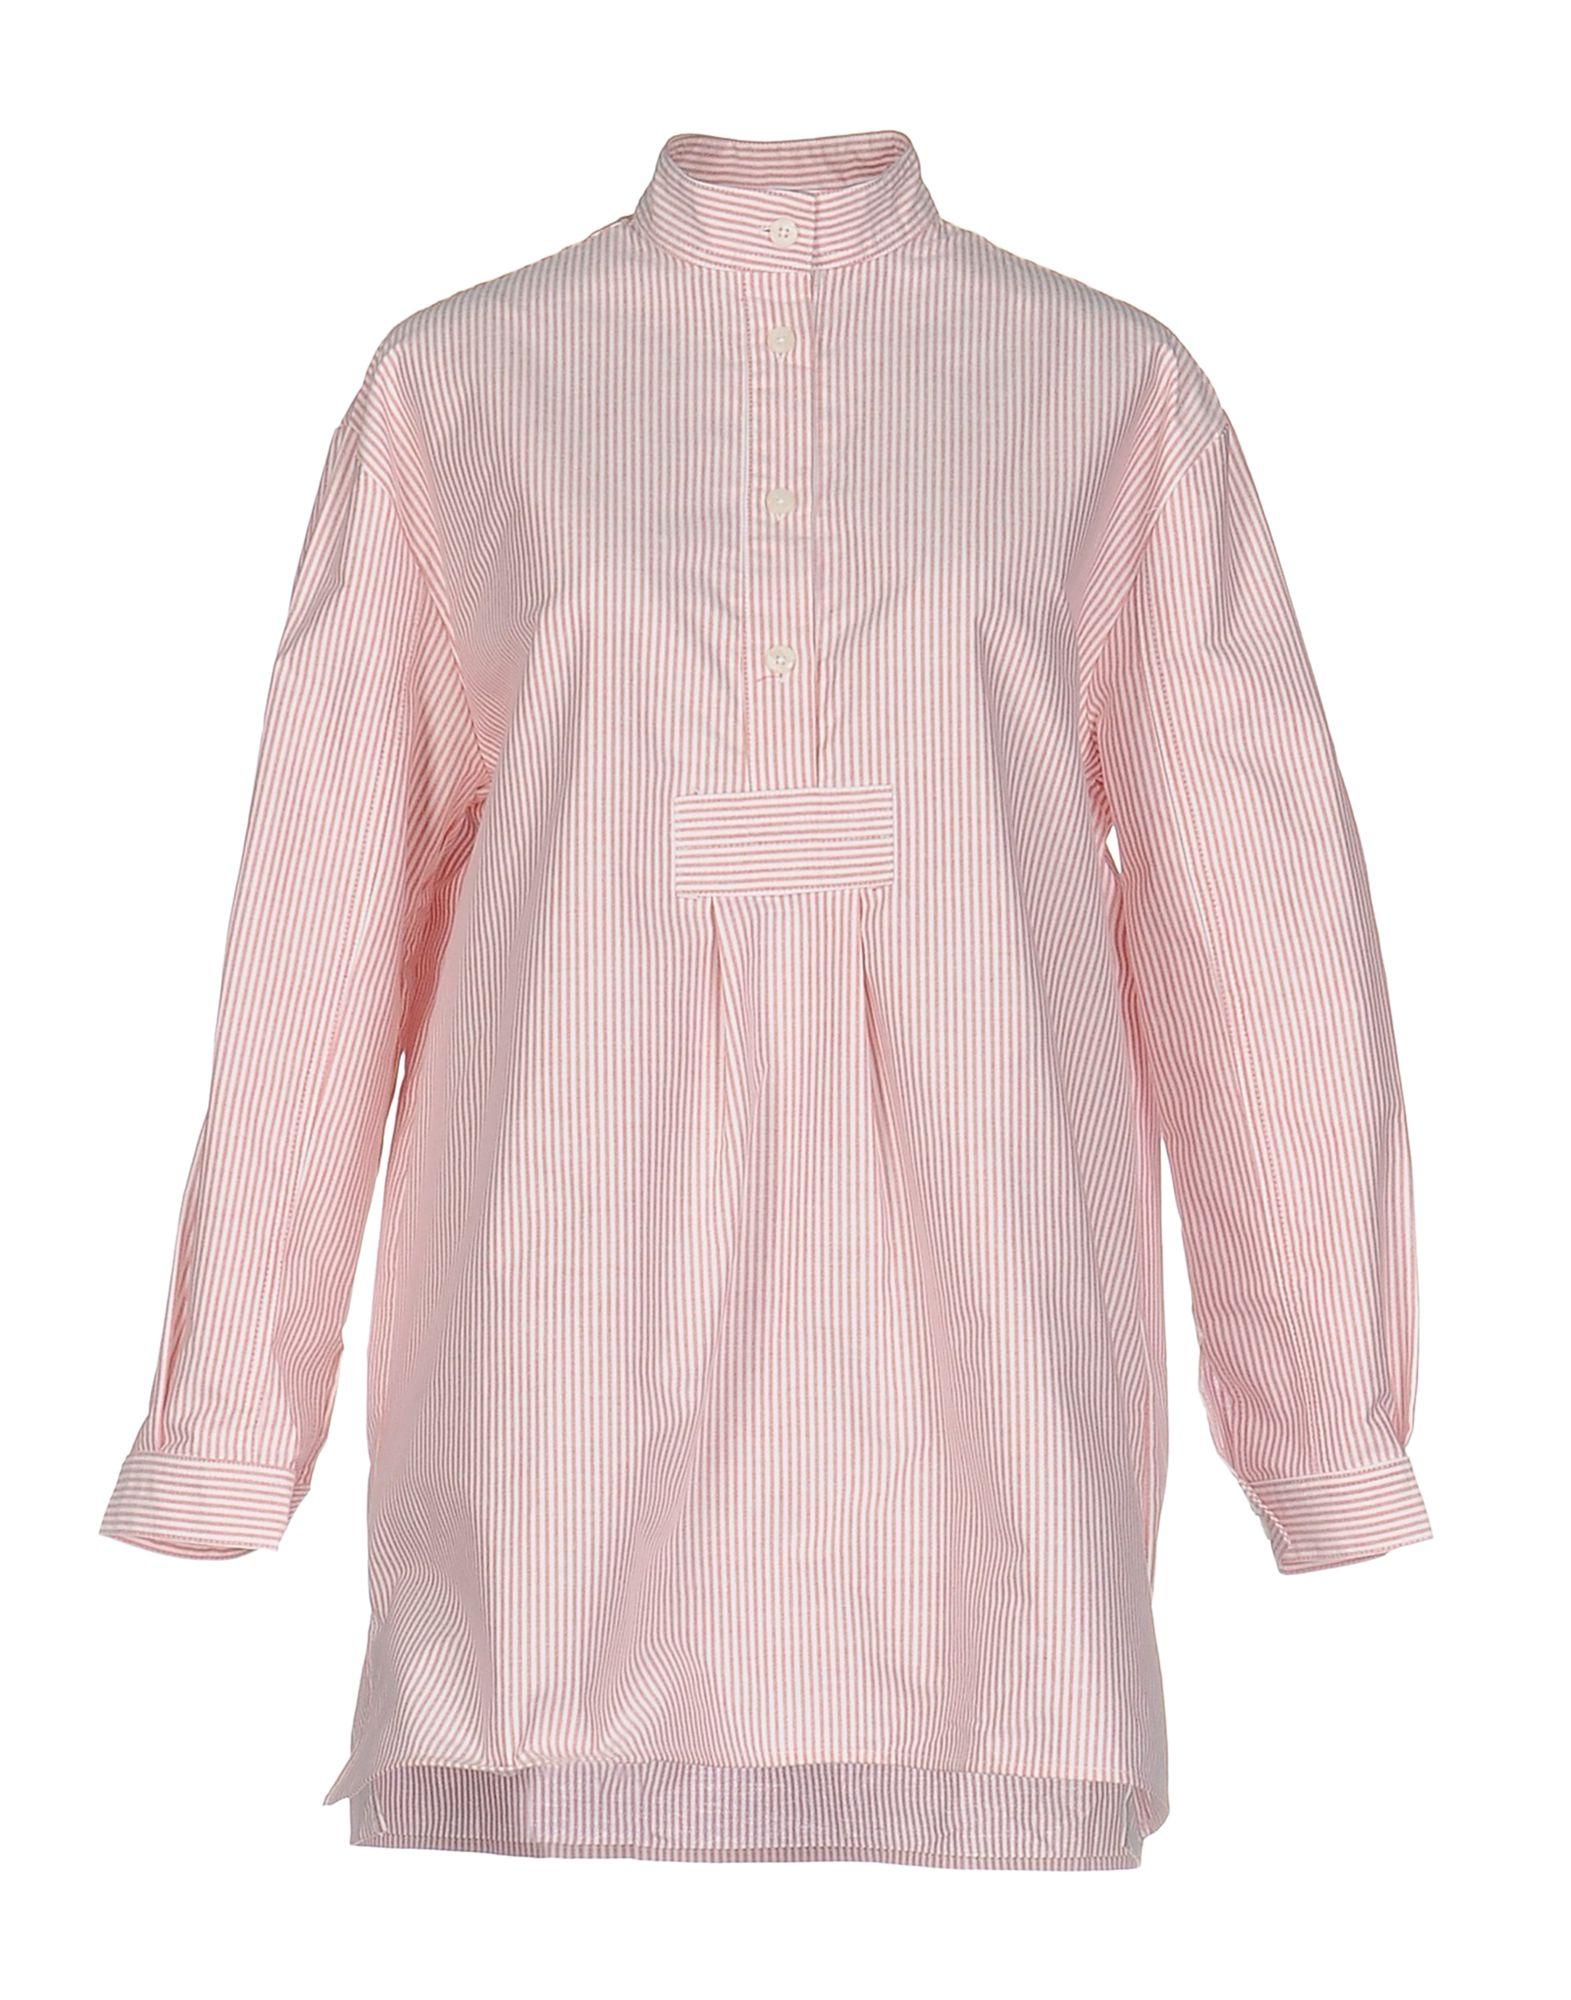 THE SLEEP SHIRT Ночная рубашка ночная рубашка the flower of love